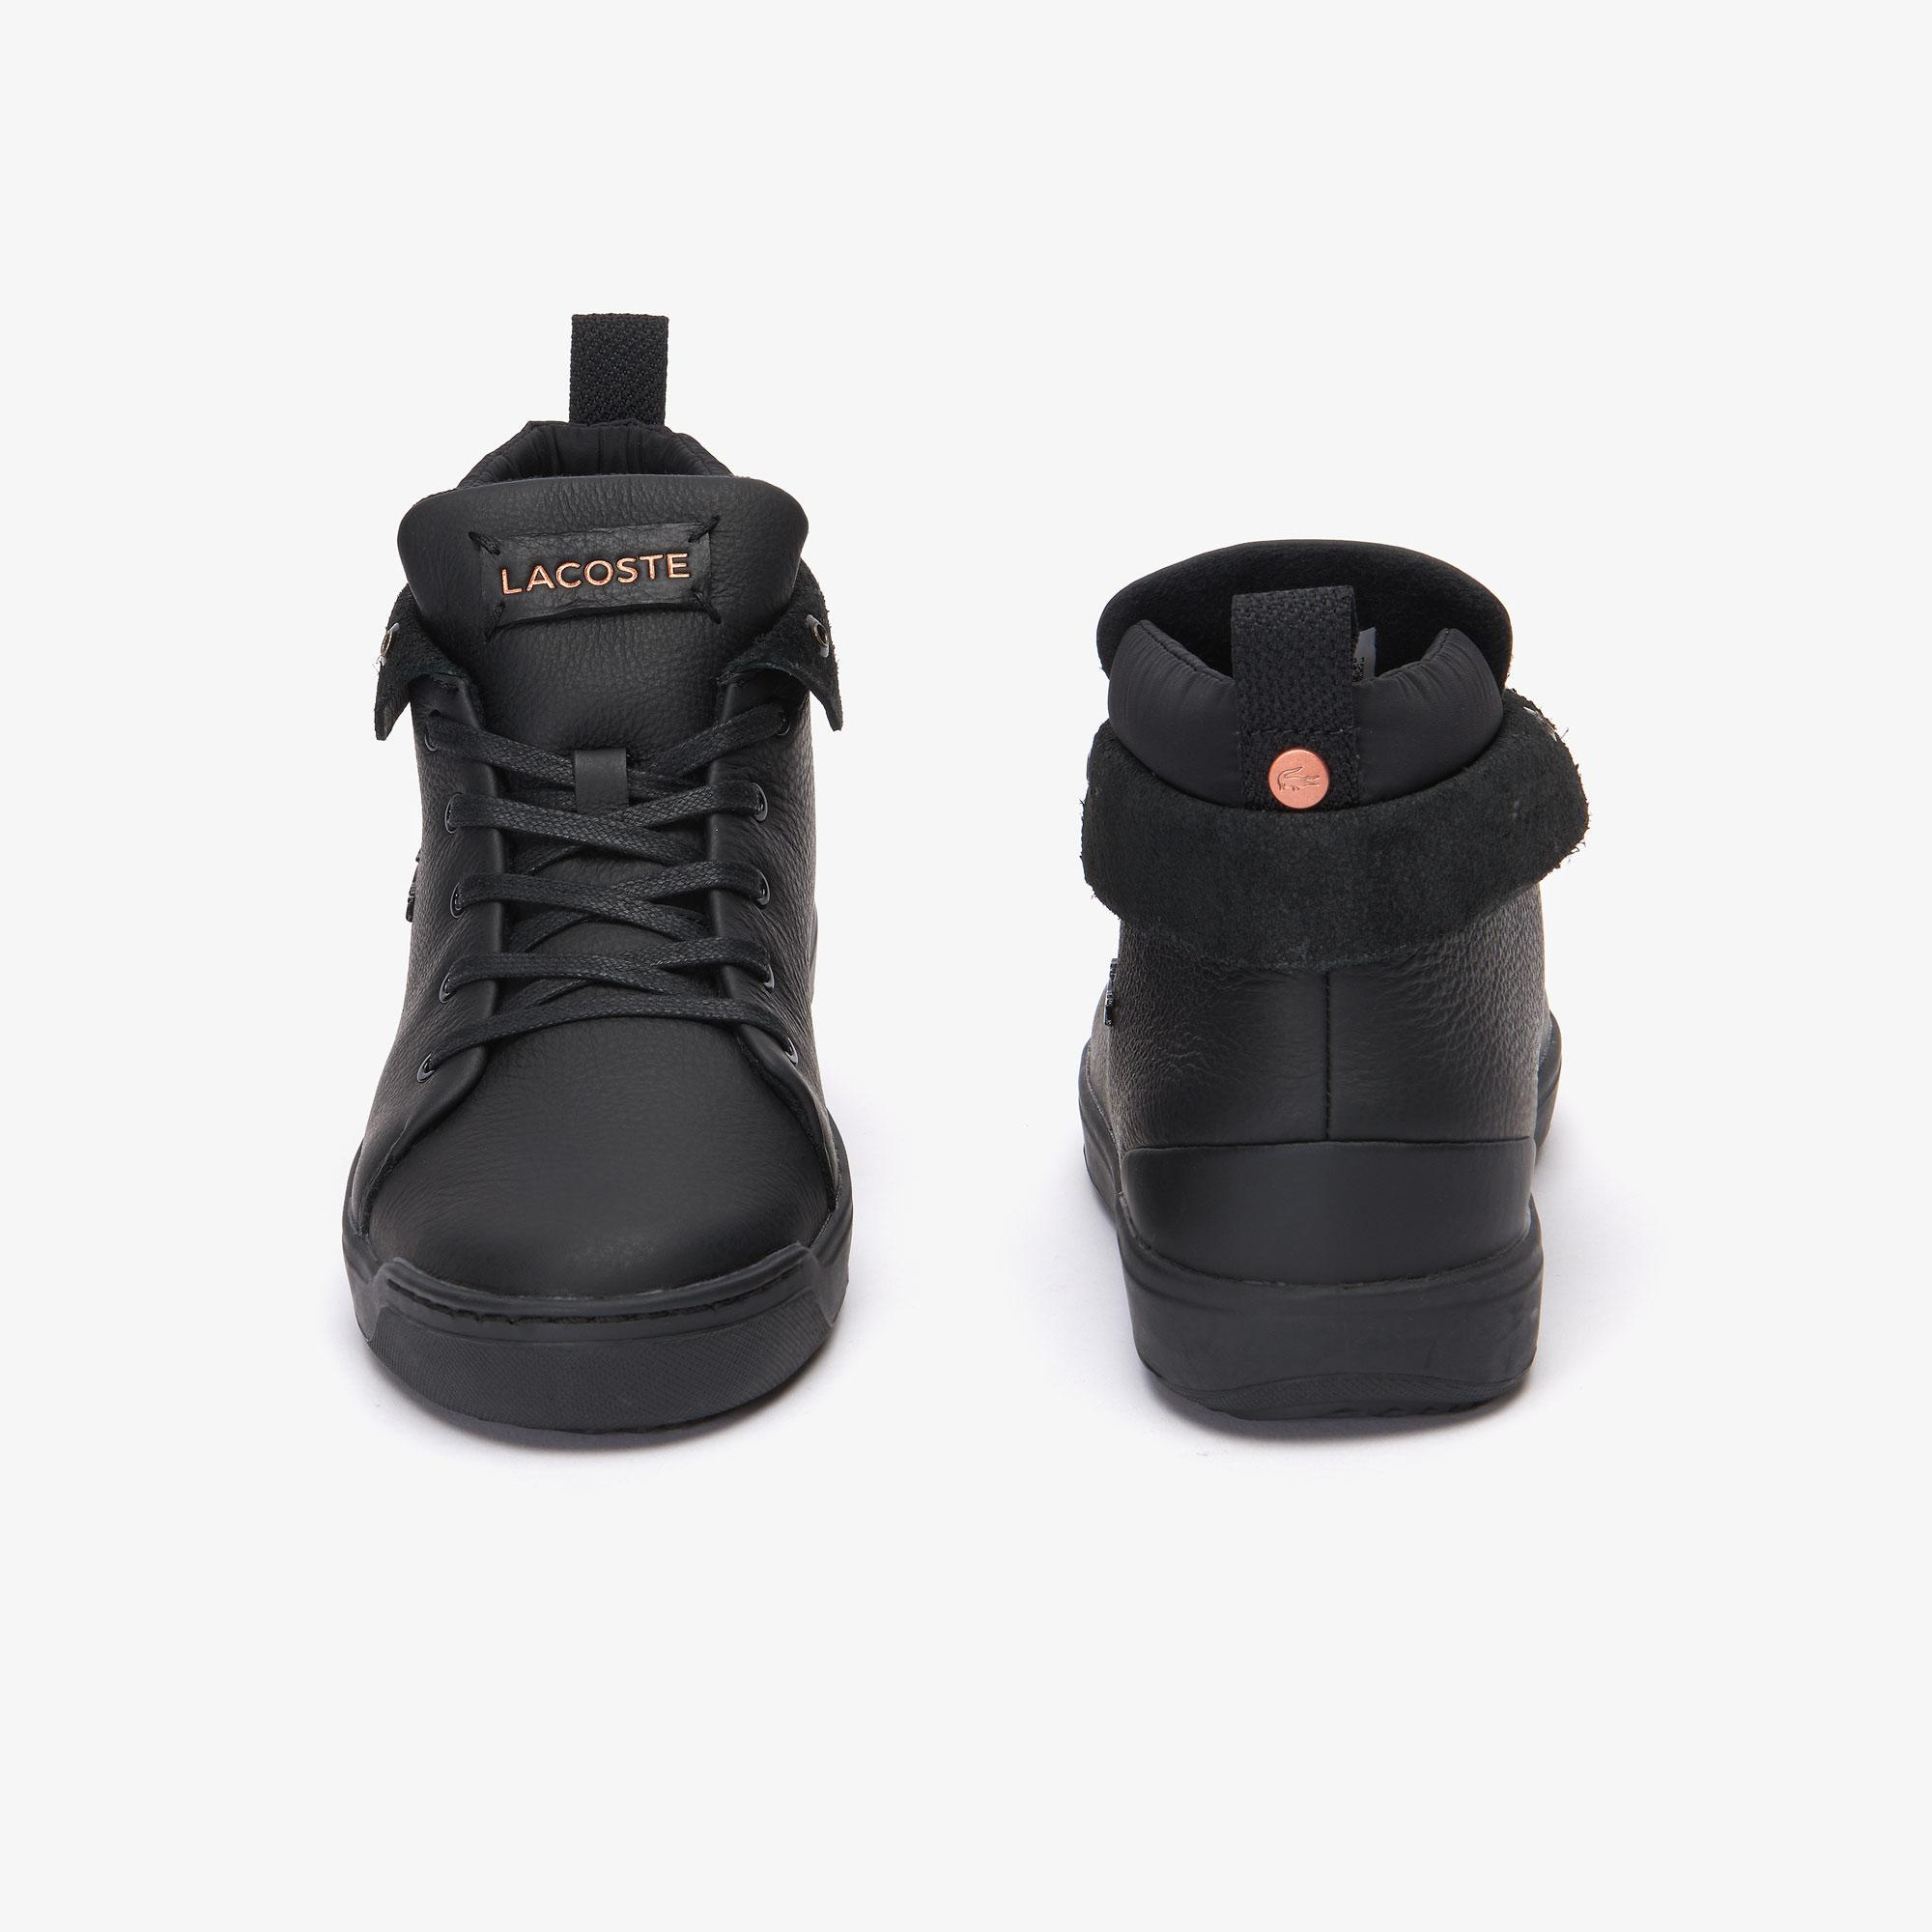 Lacoste Explorateur Classic 319 1 Damskie Boots